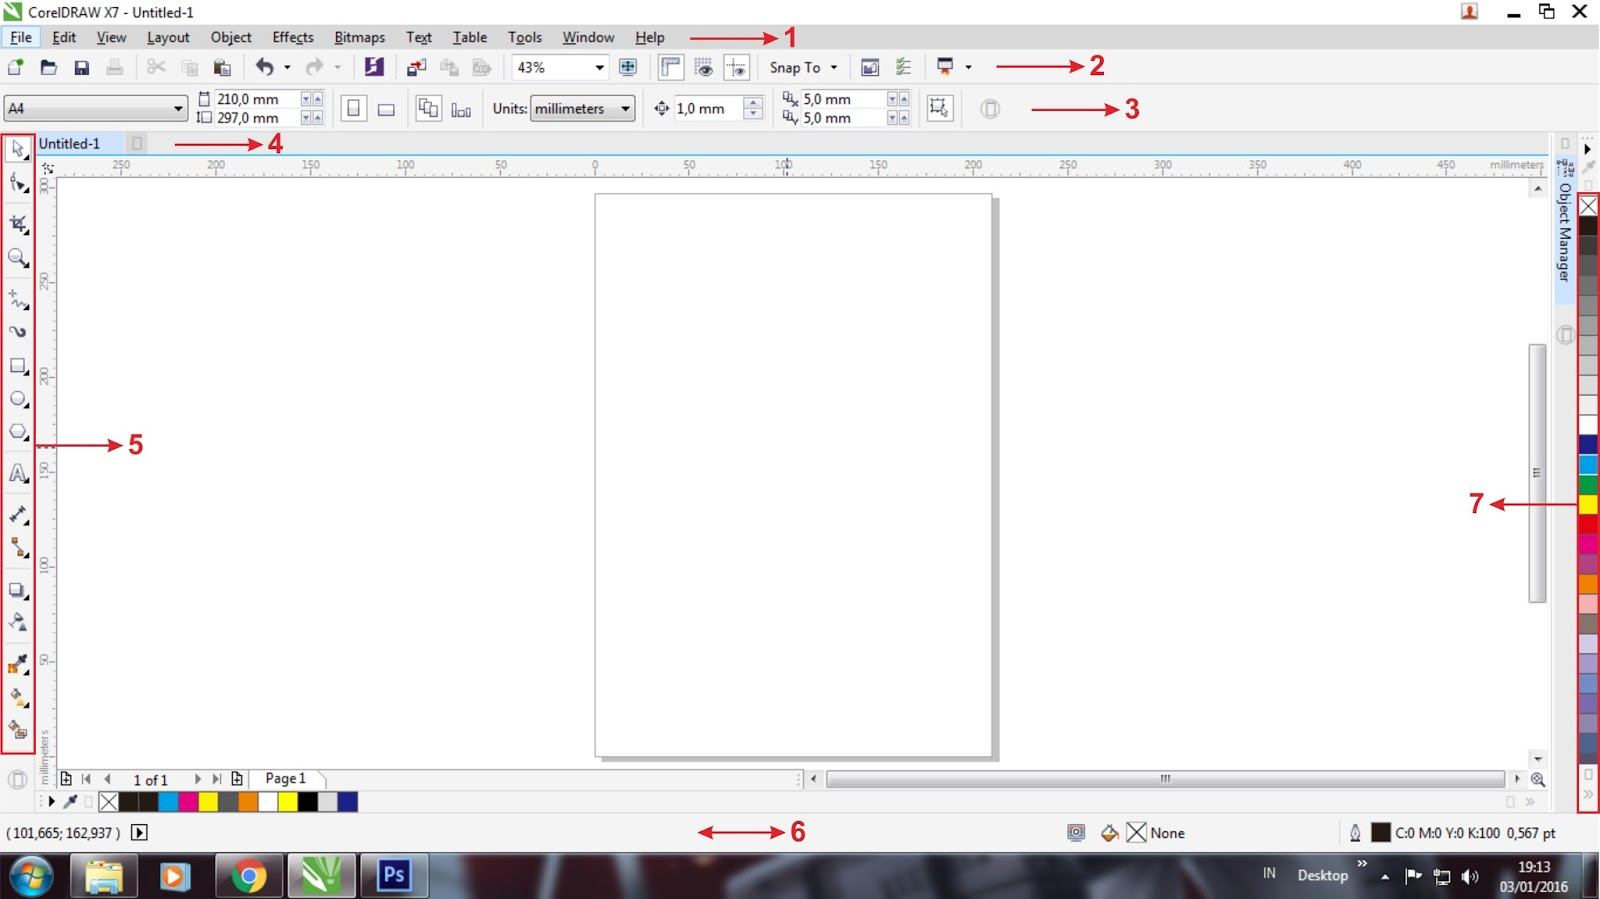 Interface Coreldraw X7 Desain Grafis